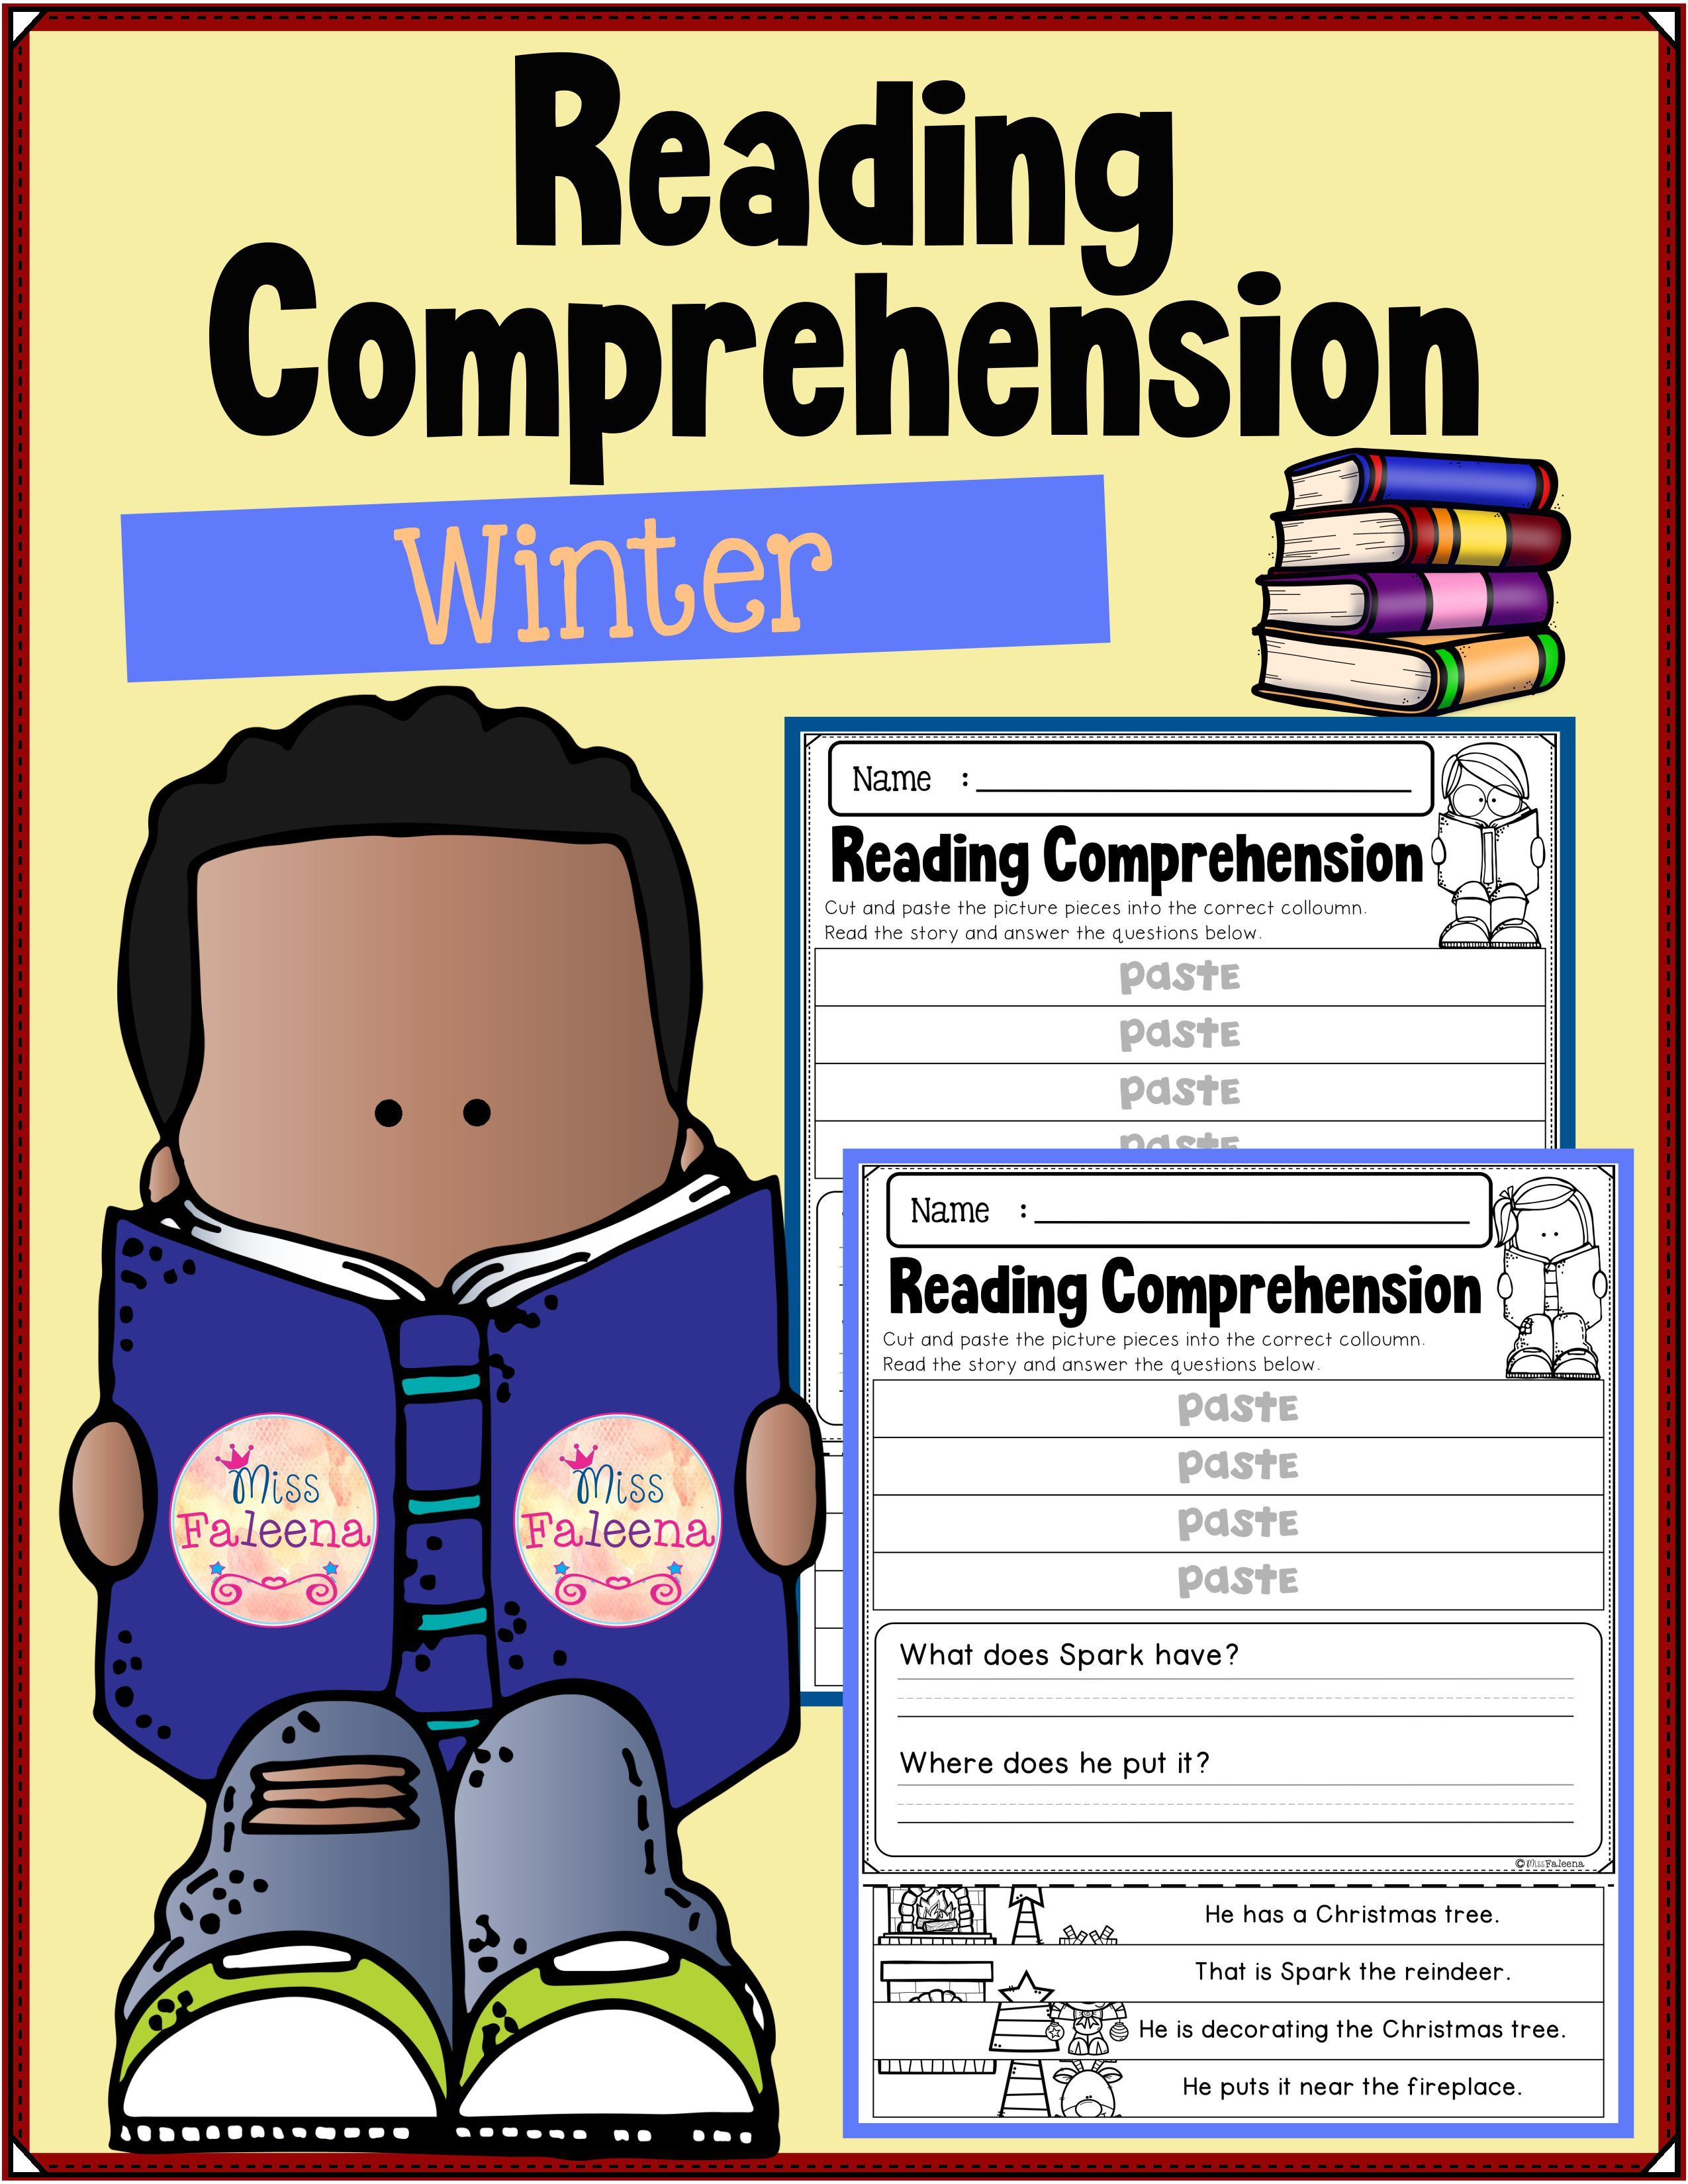 Winter Reading Comprehension Puzzles